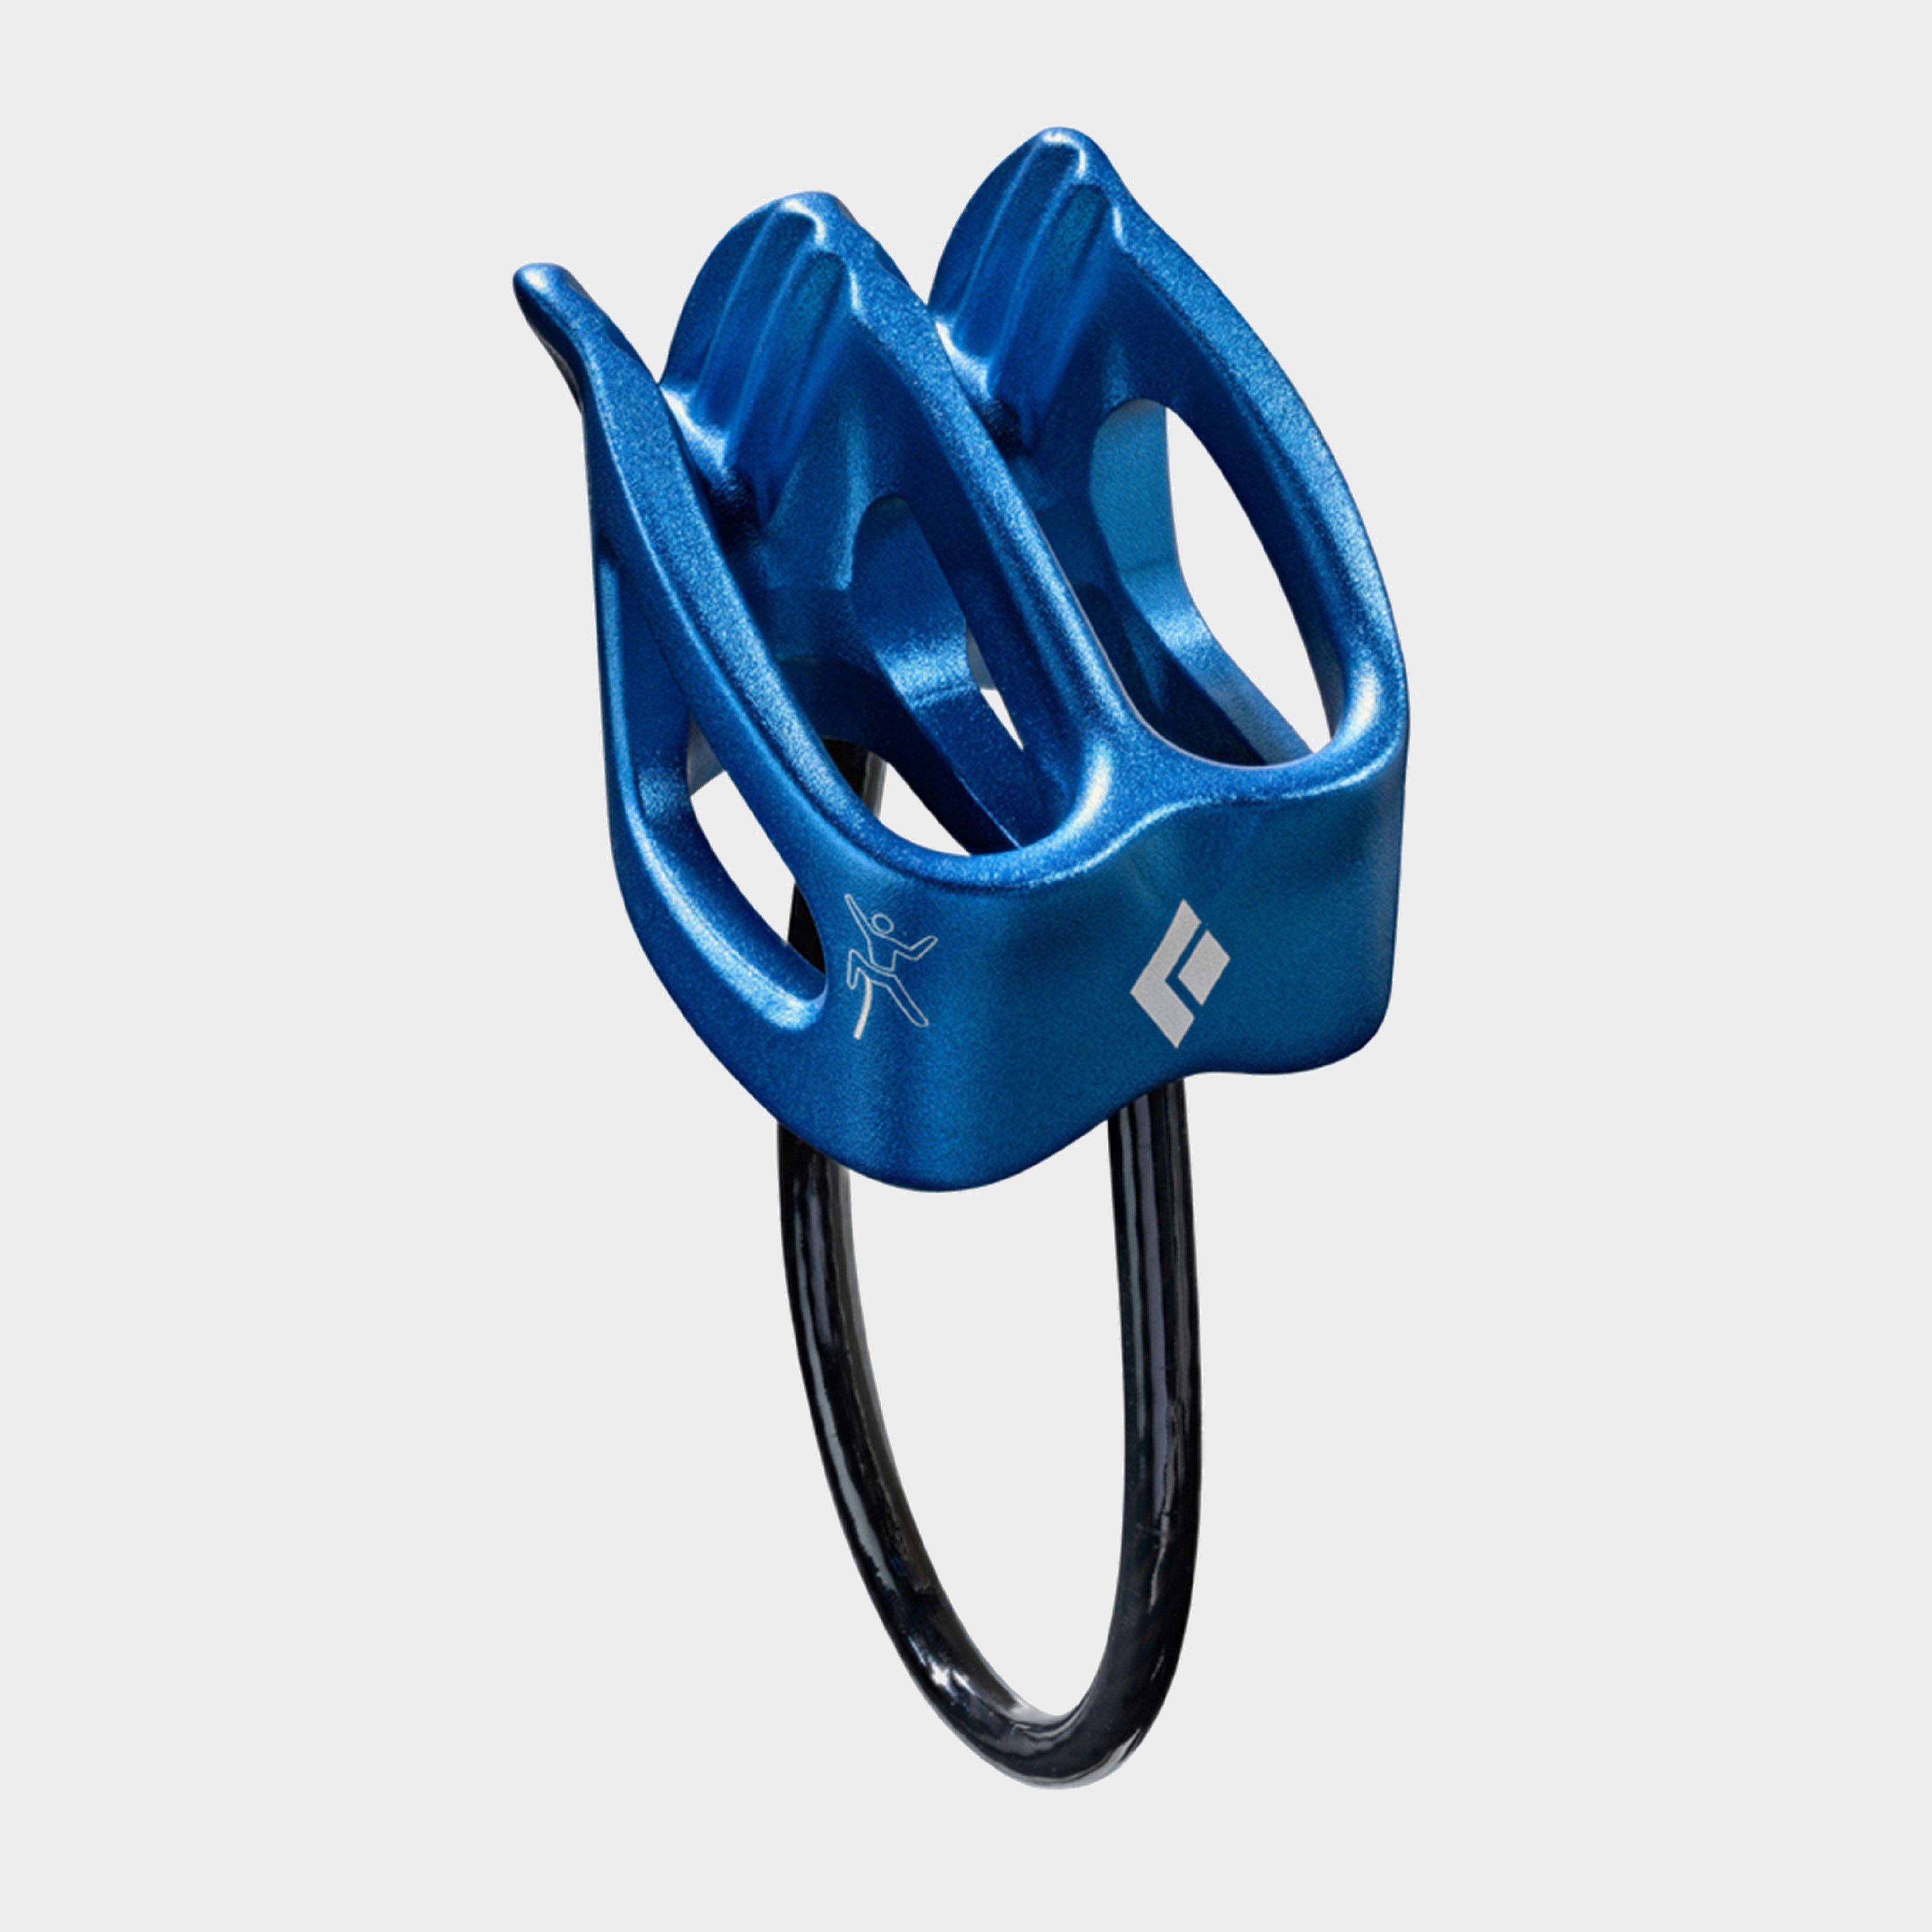 Black Diamond Atc-xp Belay Device - Blue/blu  Blue/blu